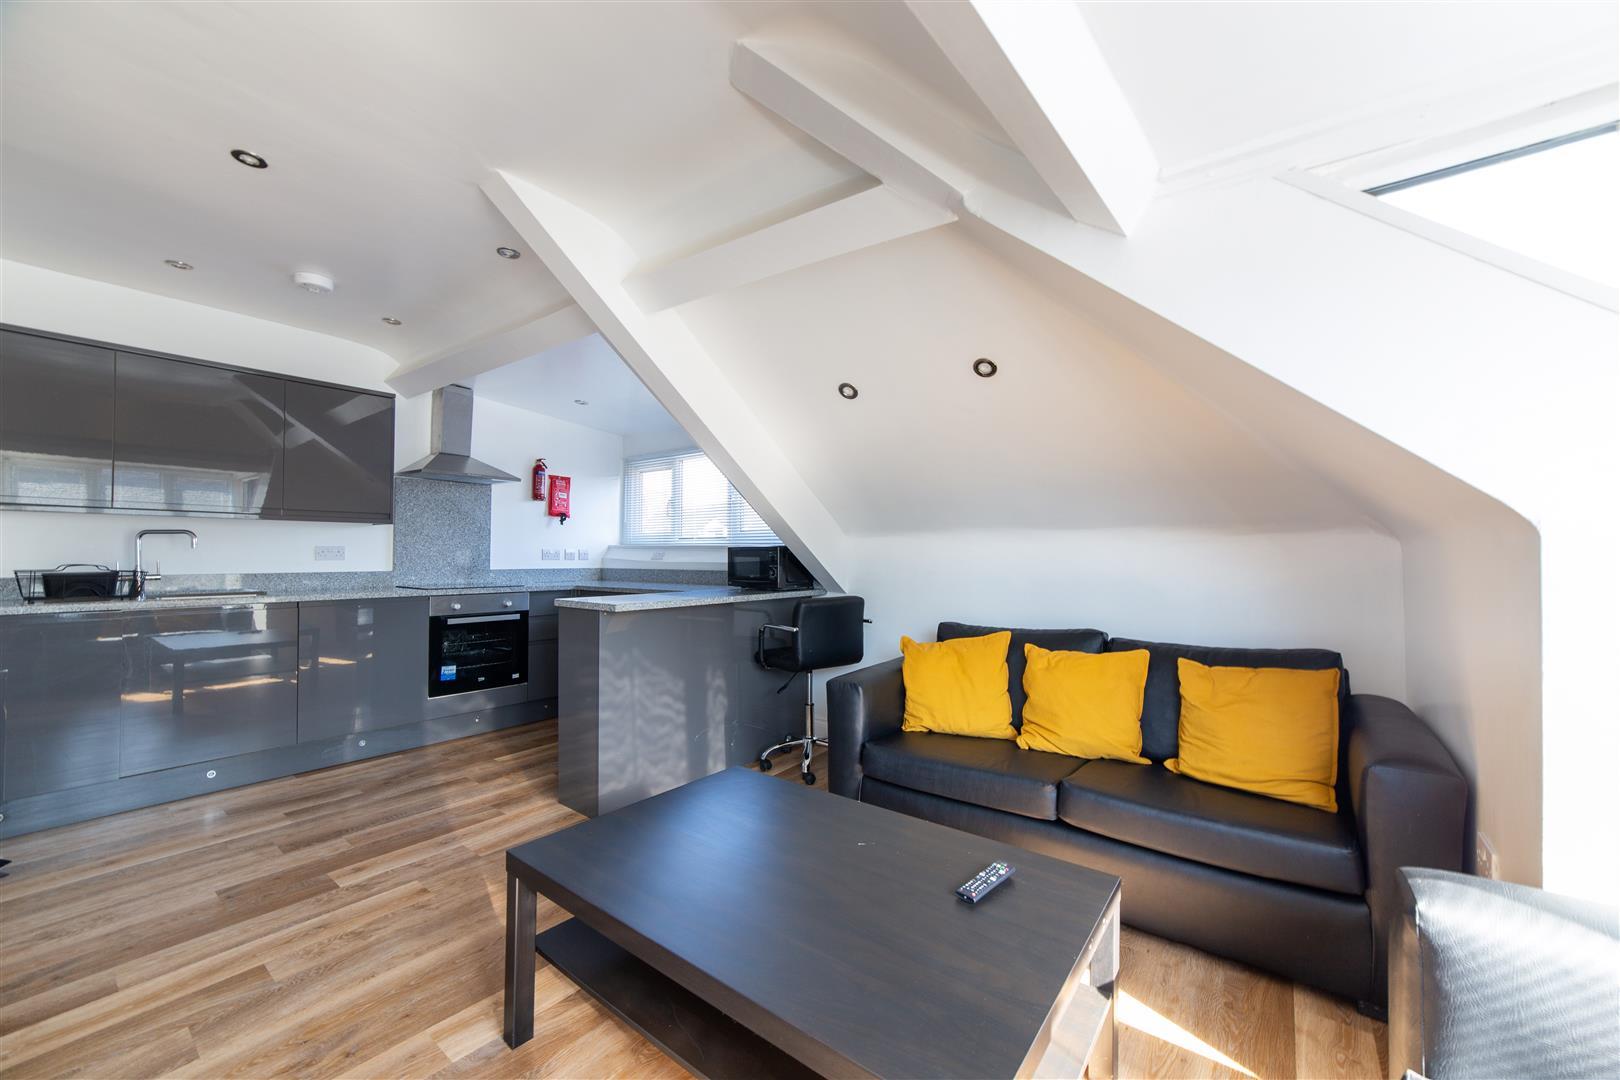 4 bed apartment to rent in Newcastle Upon Tyne, NE2 2PR, NE2